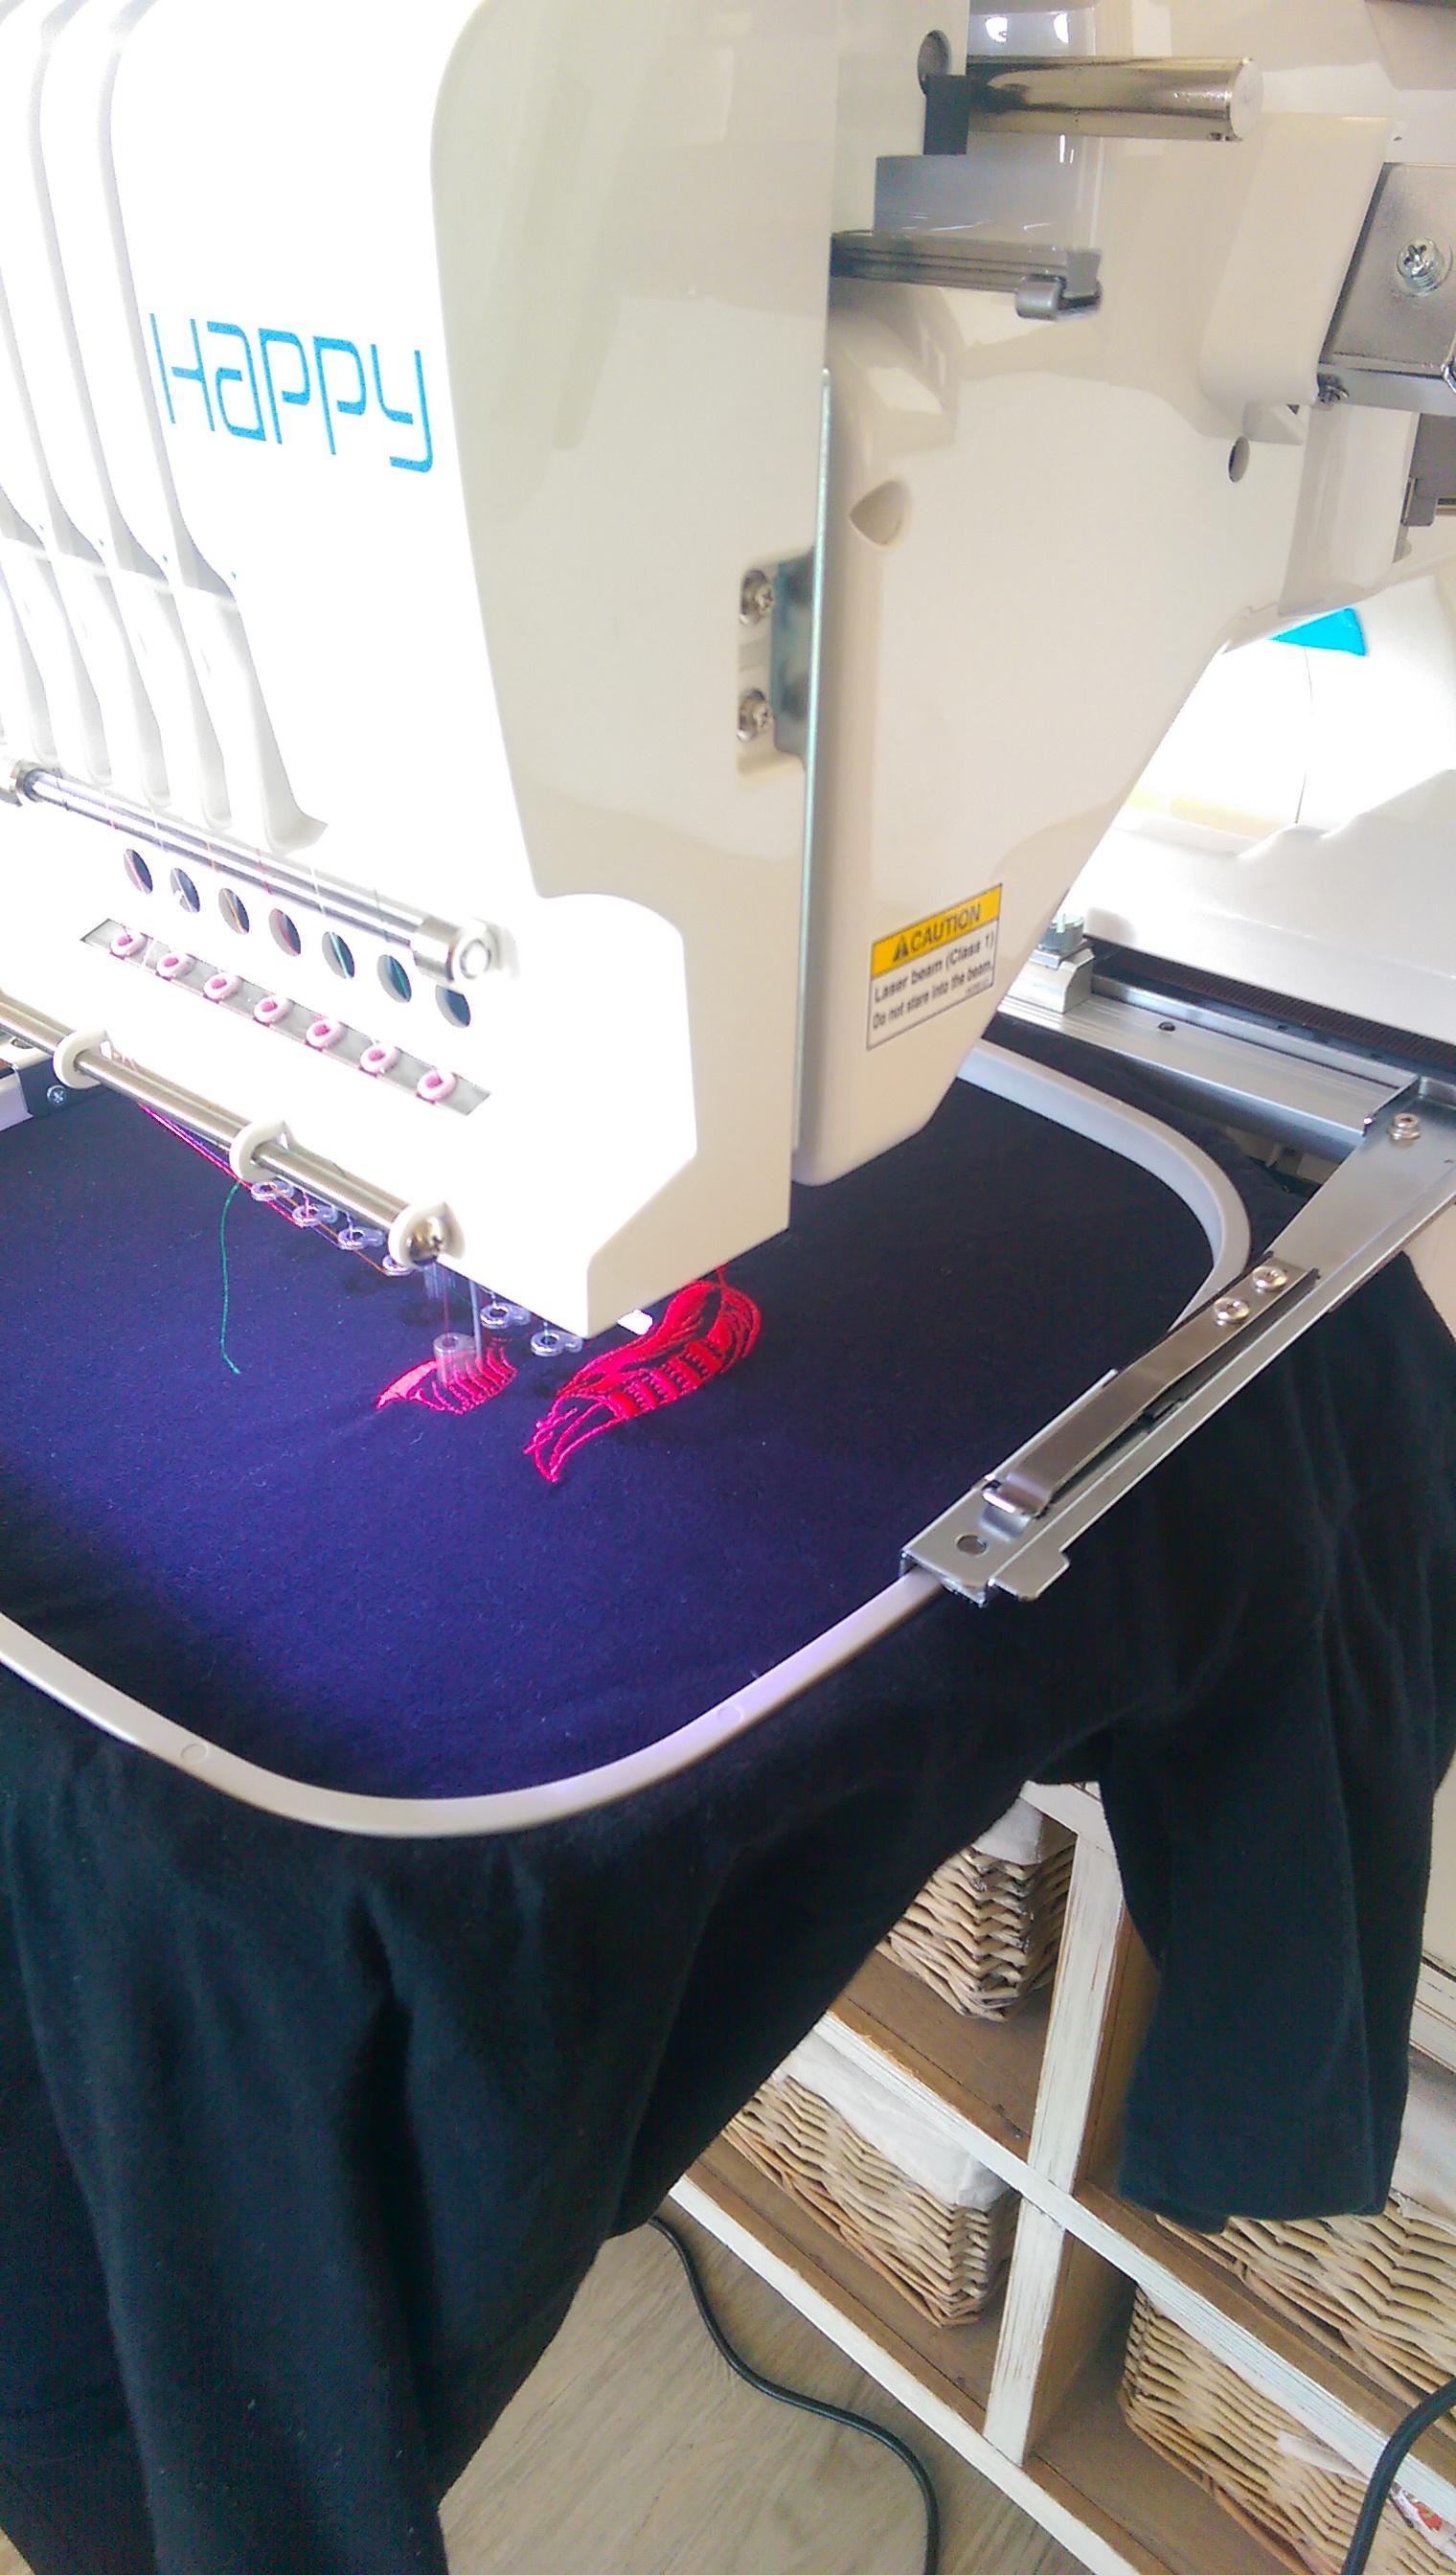 Dreamcatcher embroidery design on hoop